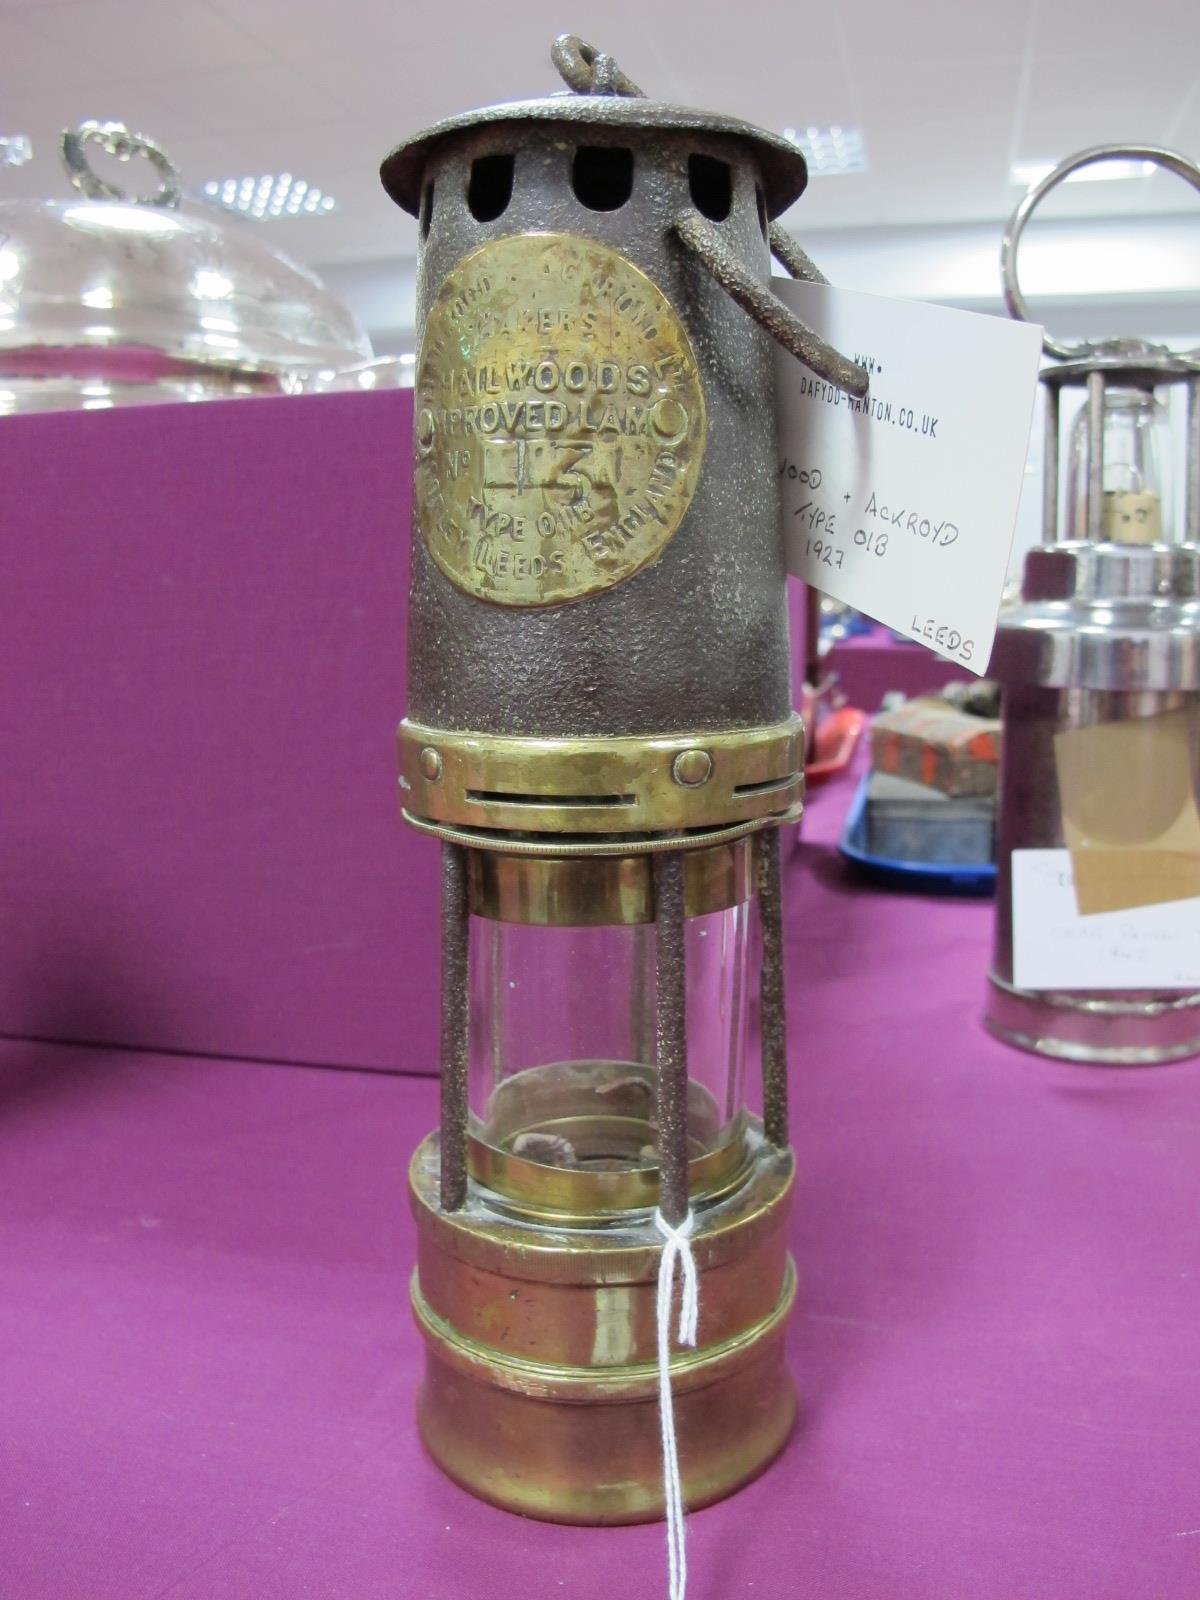 Hailwood & Ackroyd of Otley, Leeds Type 0.1B Miners Lamp, circa 1927, stamped No. 13?, 27cm high